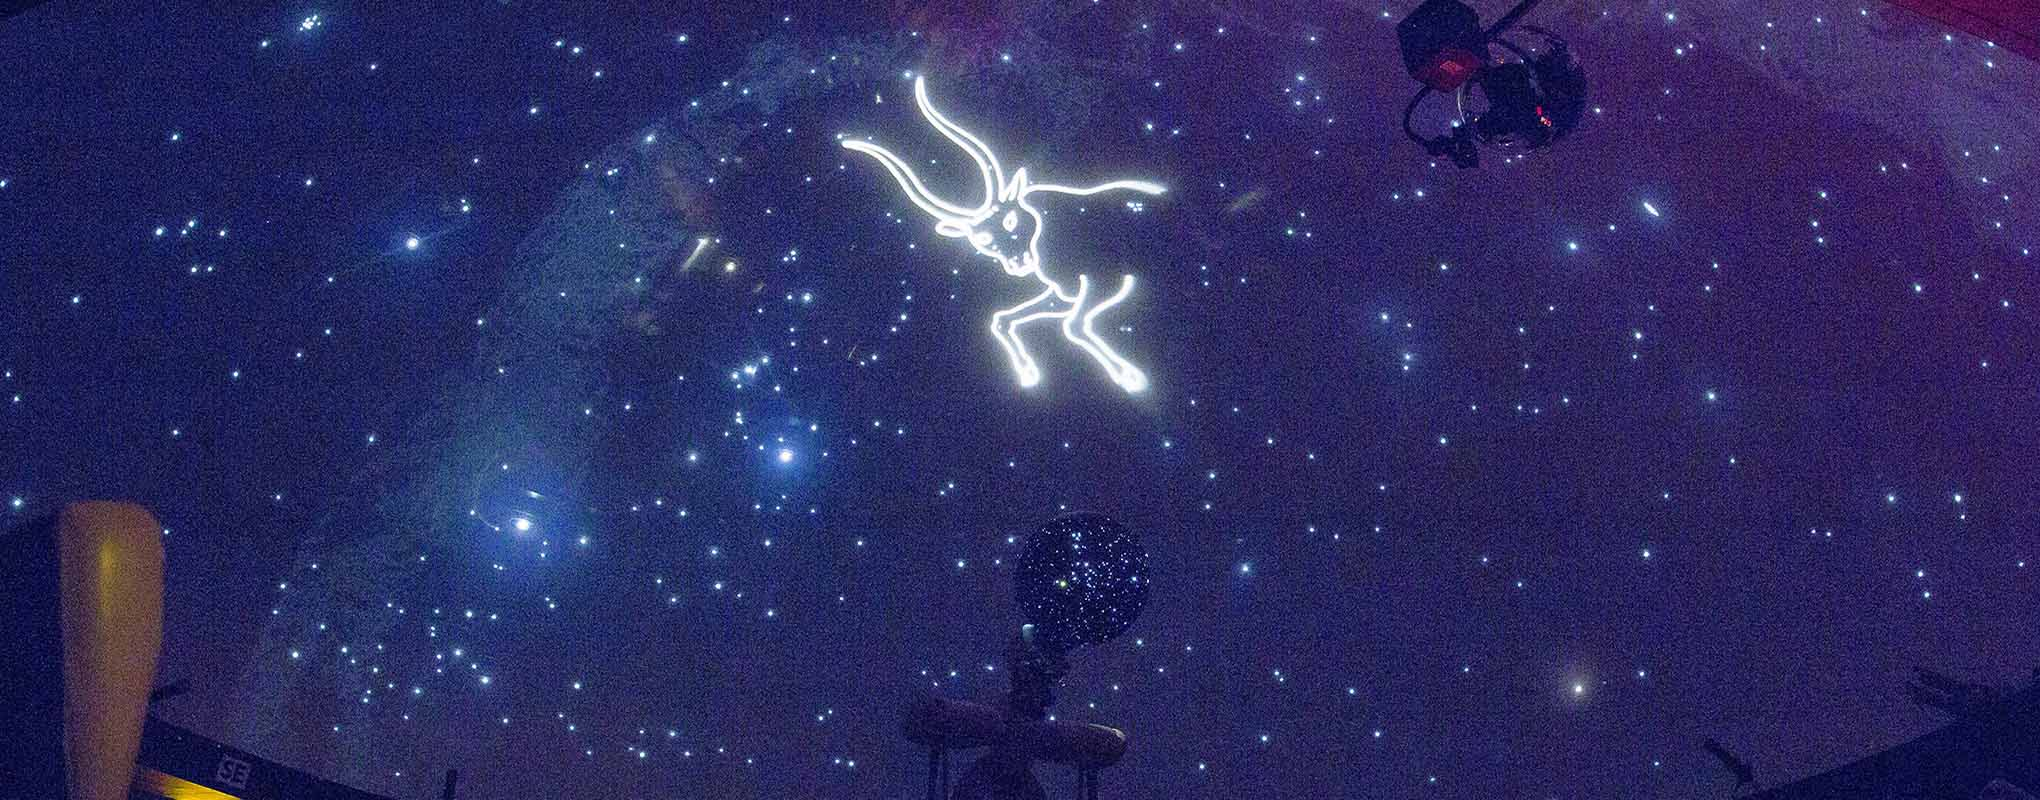 SFSU Planetarium projecting taurus